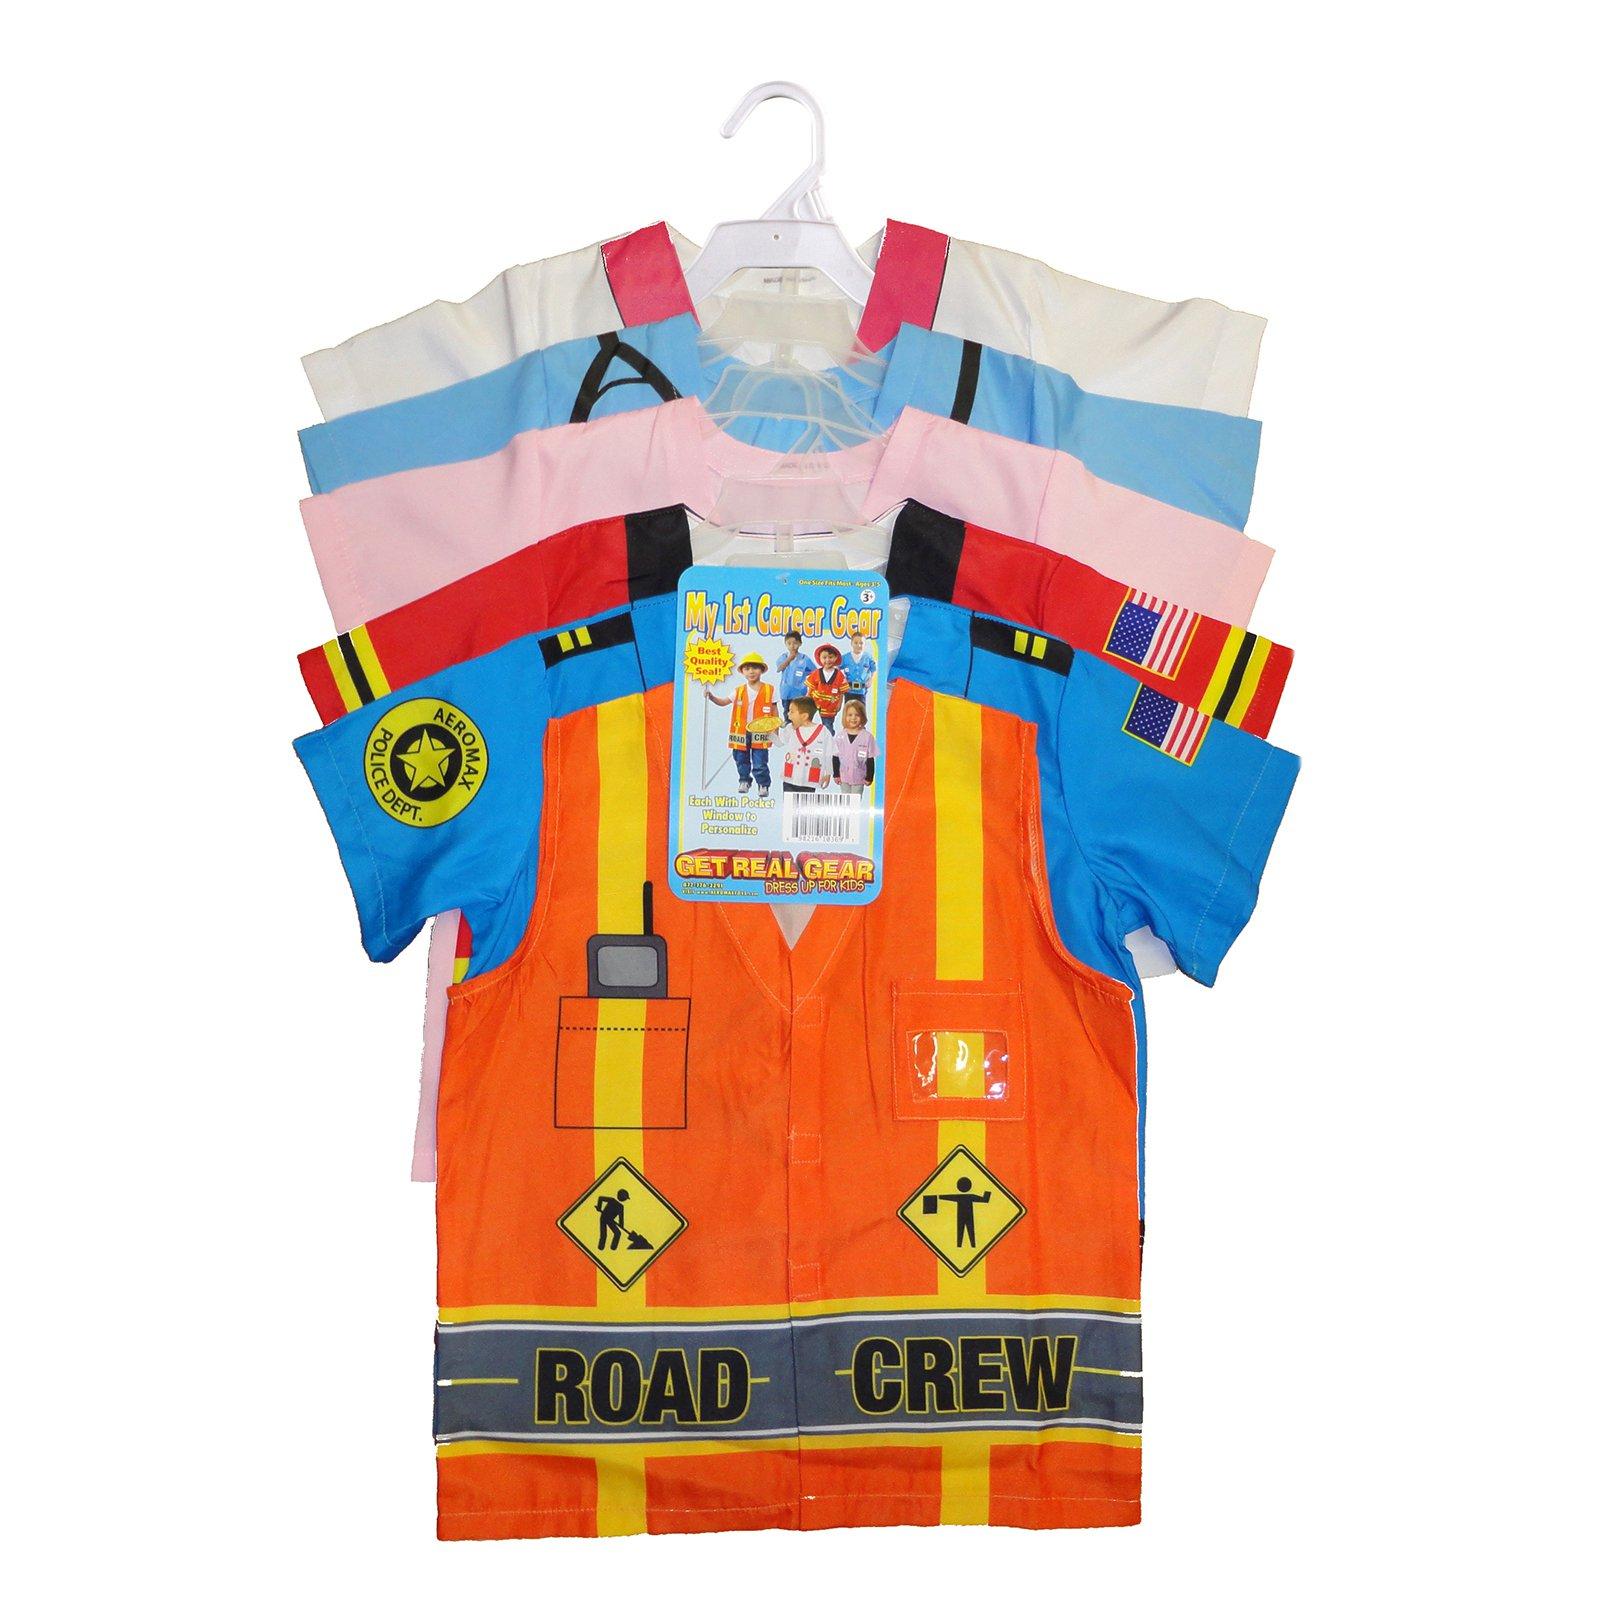 Aeromax My 1st Career Gear Costume Assortment